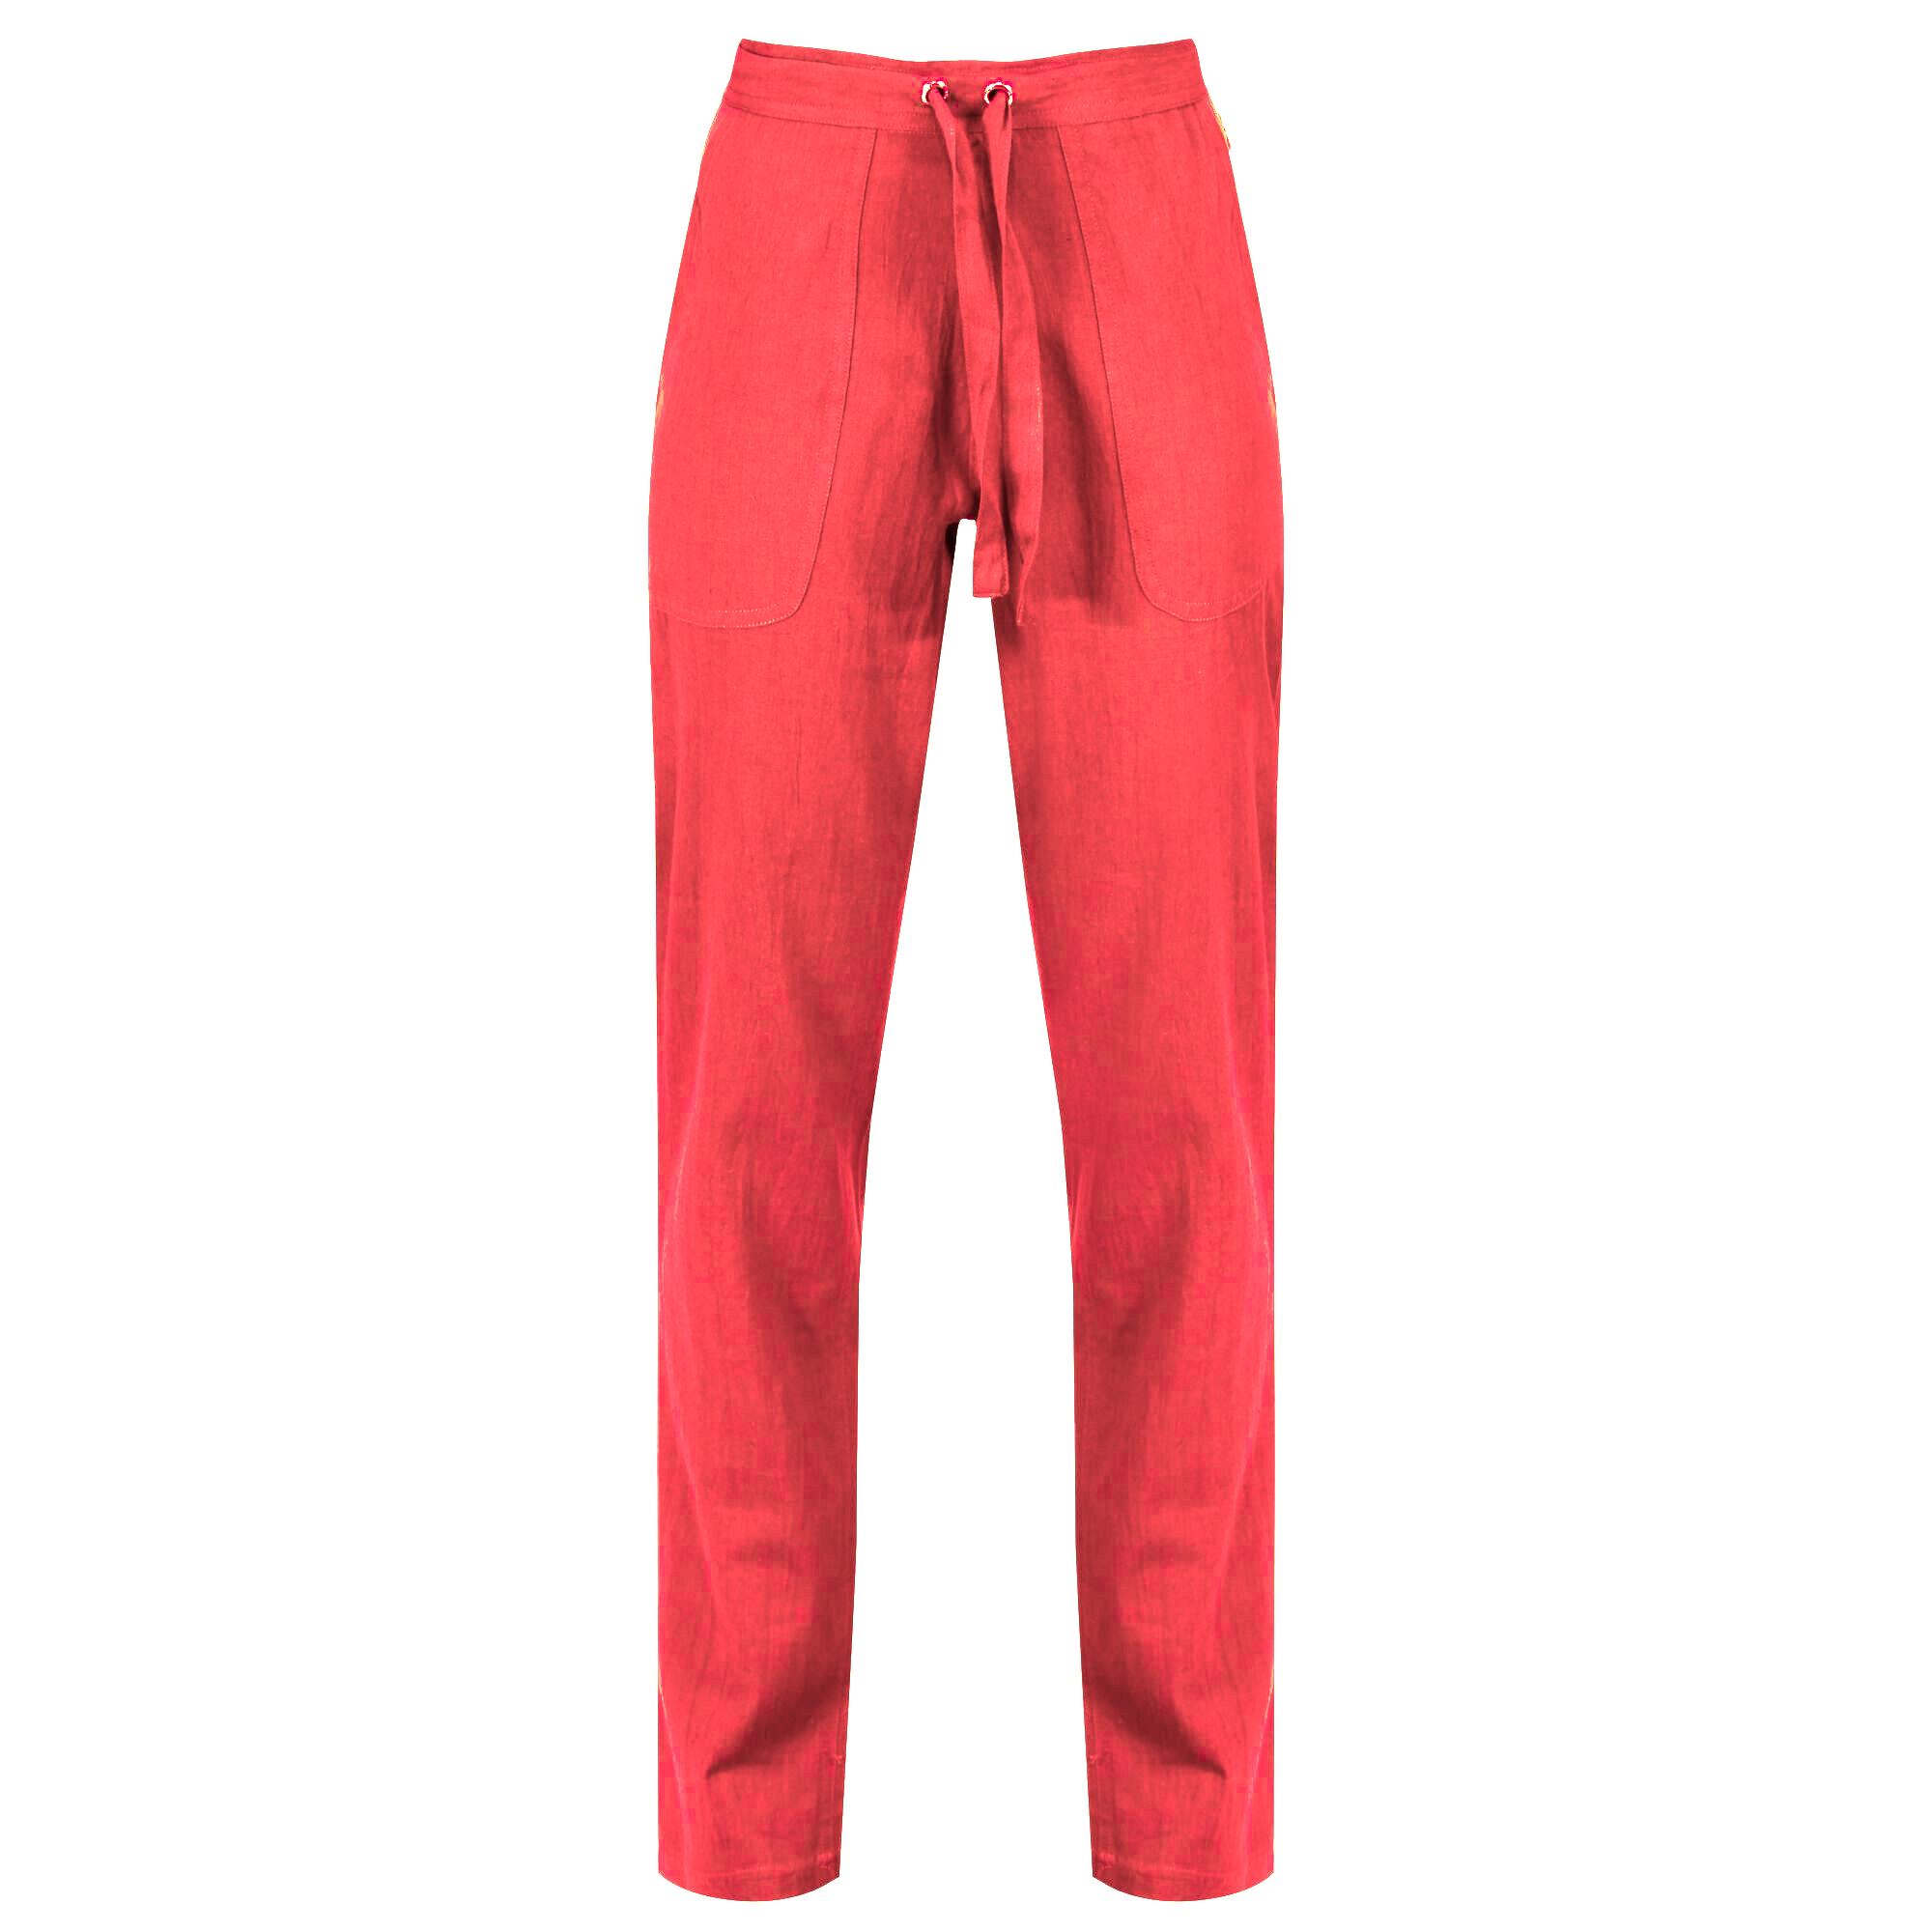 Regatta Womens/Ladies Quanda Coolweave Cotton Trousers (18 UK) (Red Sky)